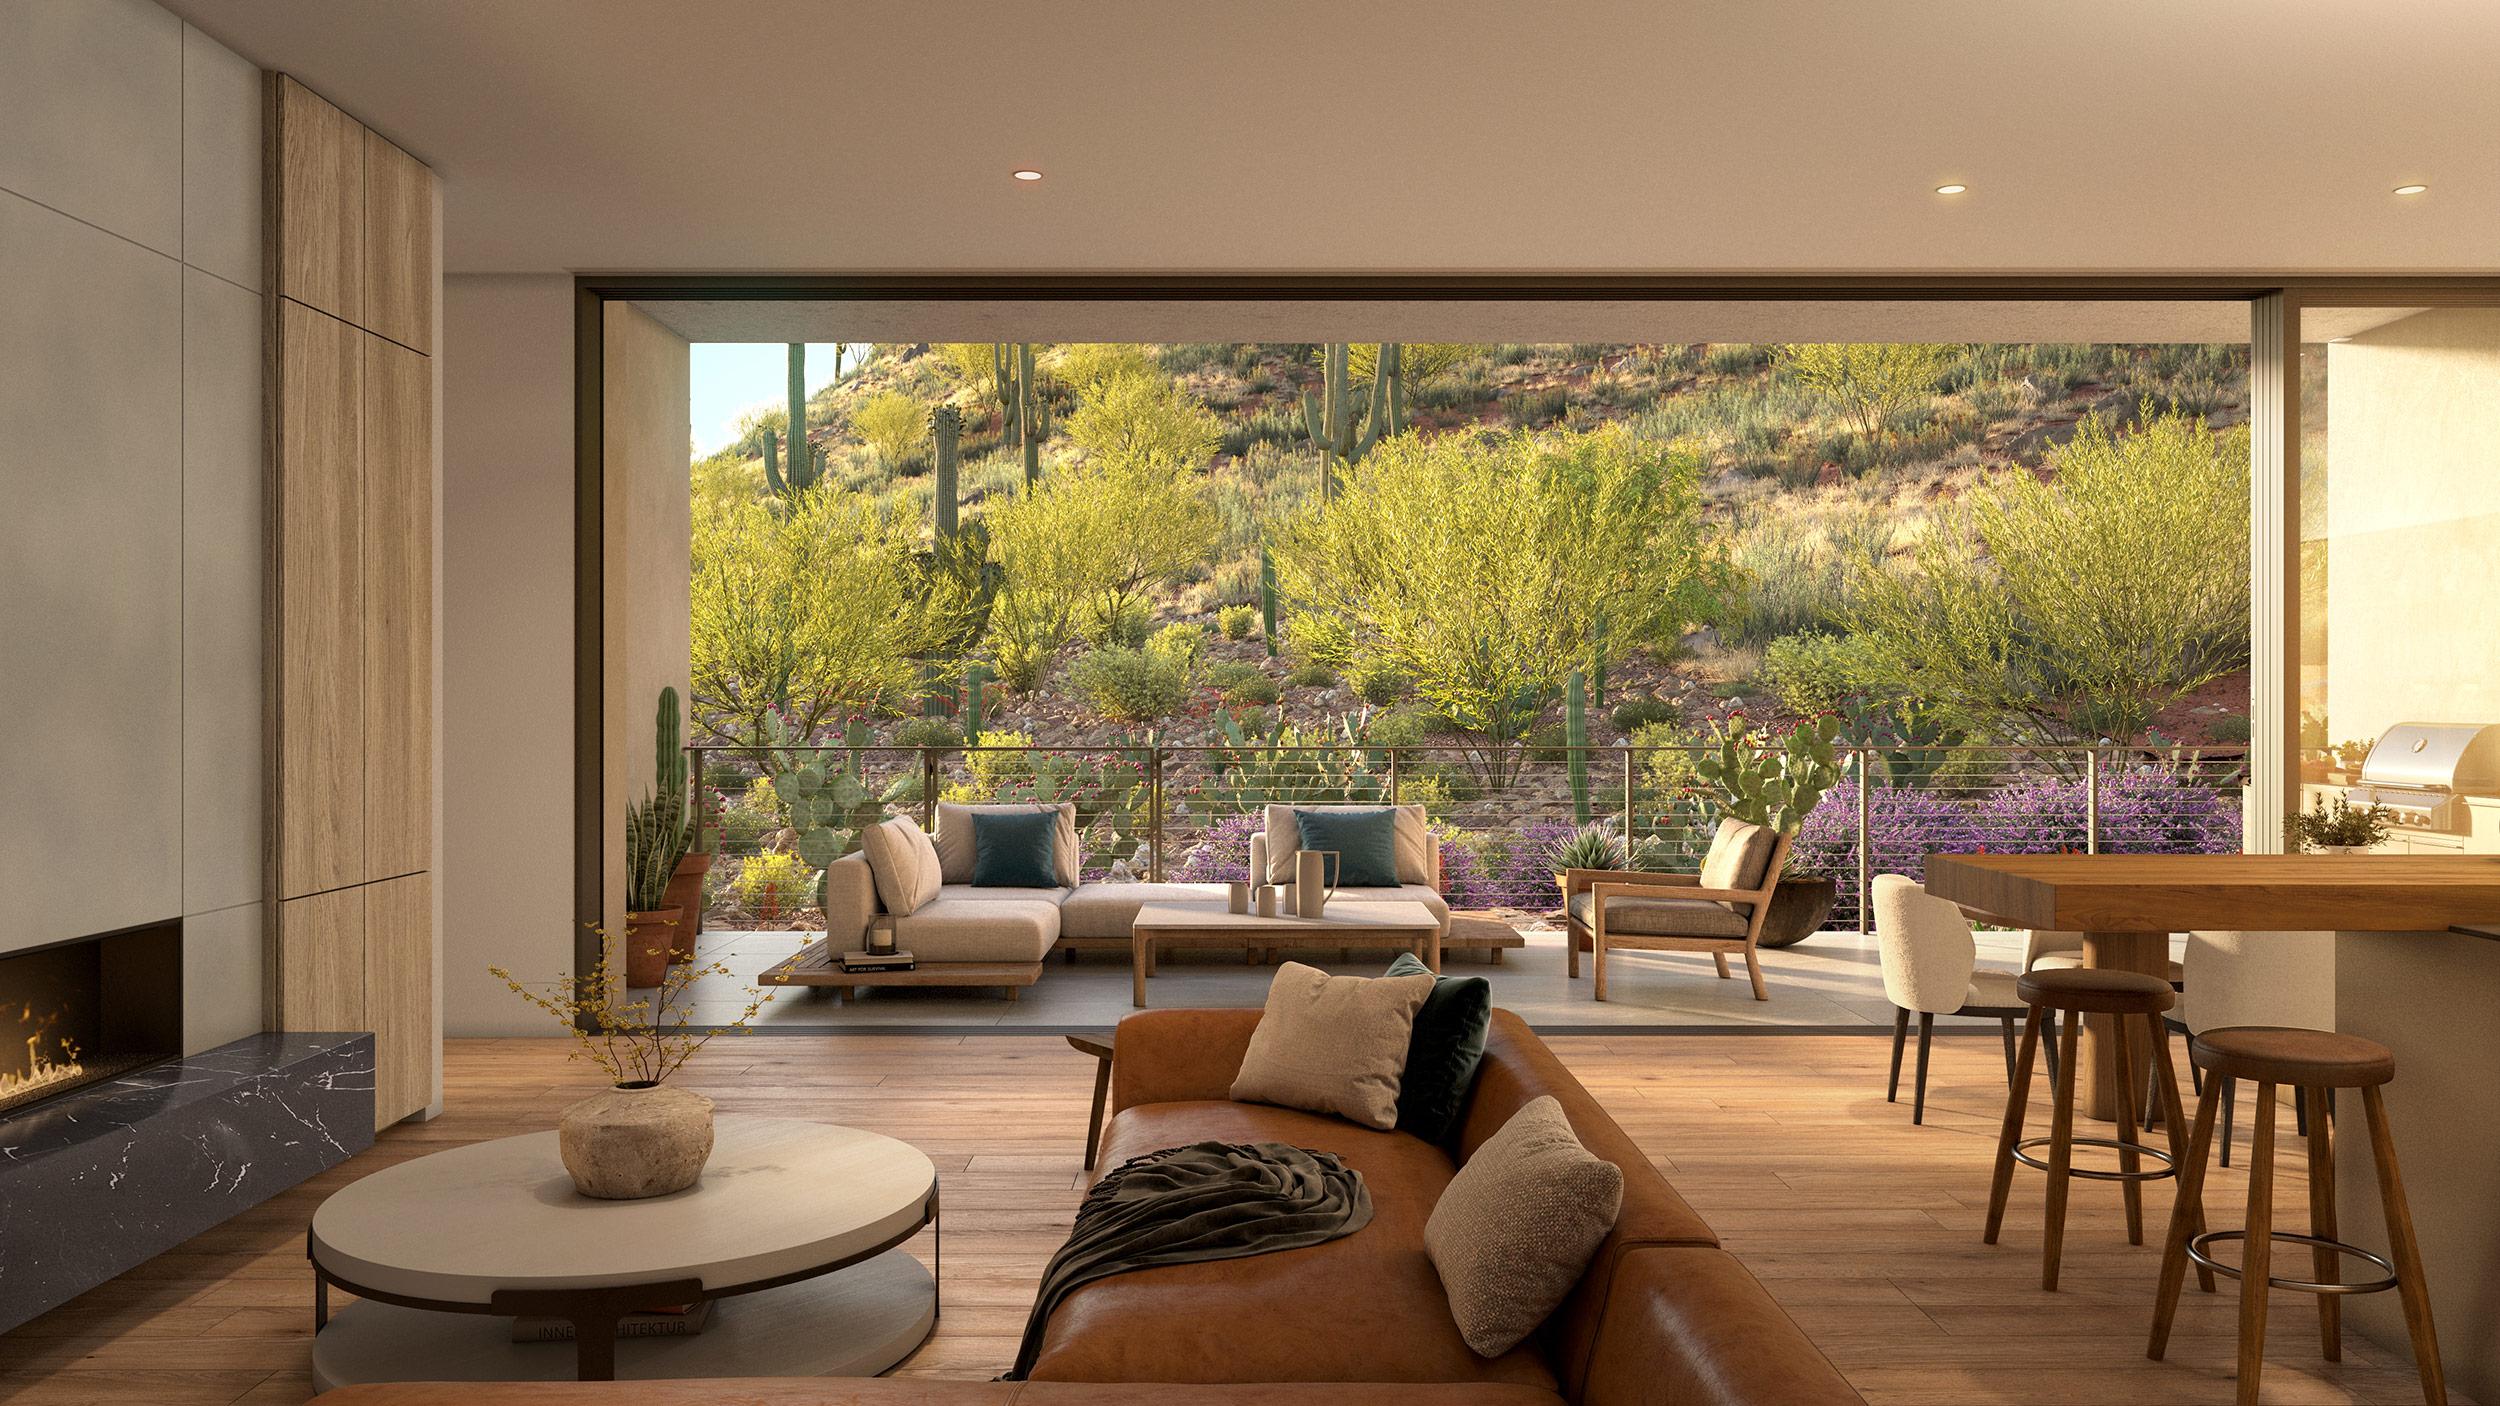 Interiors open to the cactus garden and Camelback Mountain's natural flora and fauna.